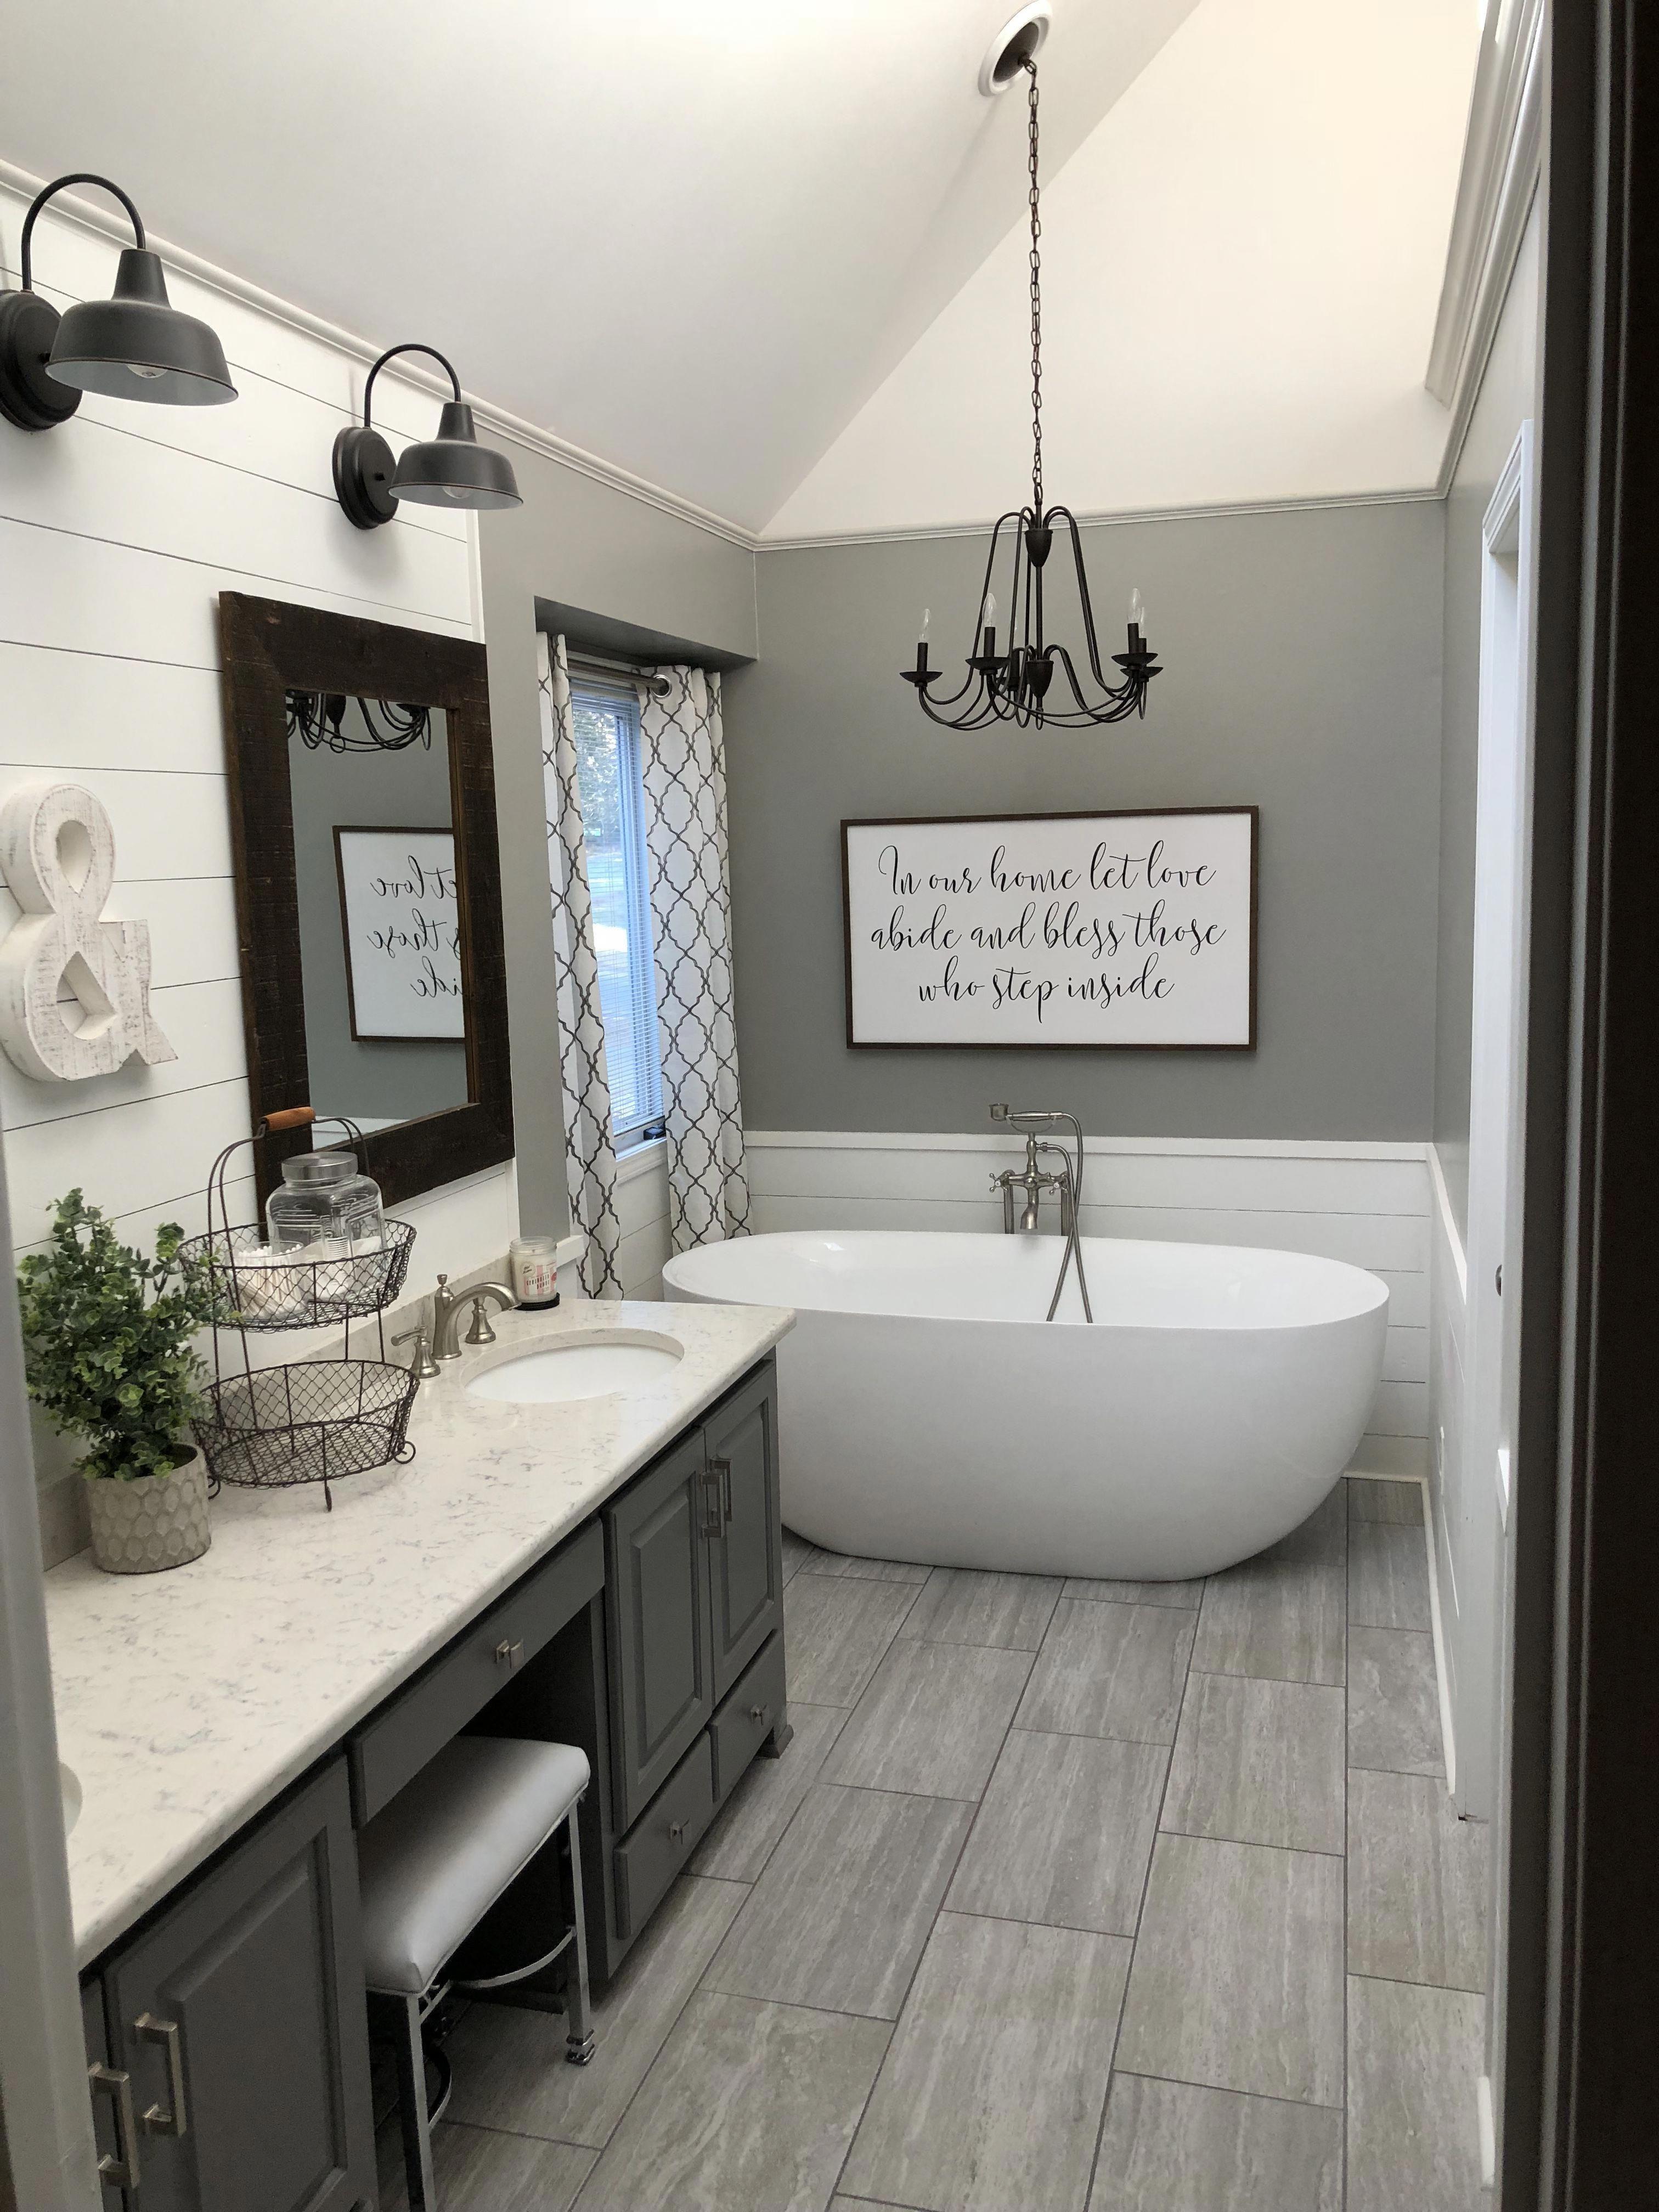 Discover Amazing Bathroom Remodel Ideas Diy Bathroomideasbrowardcounty Bathroomremodelpalo Bathroom Remodel Master Farmhouse Bathroom Decor Bathrooms Remodel